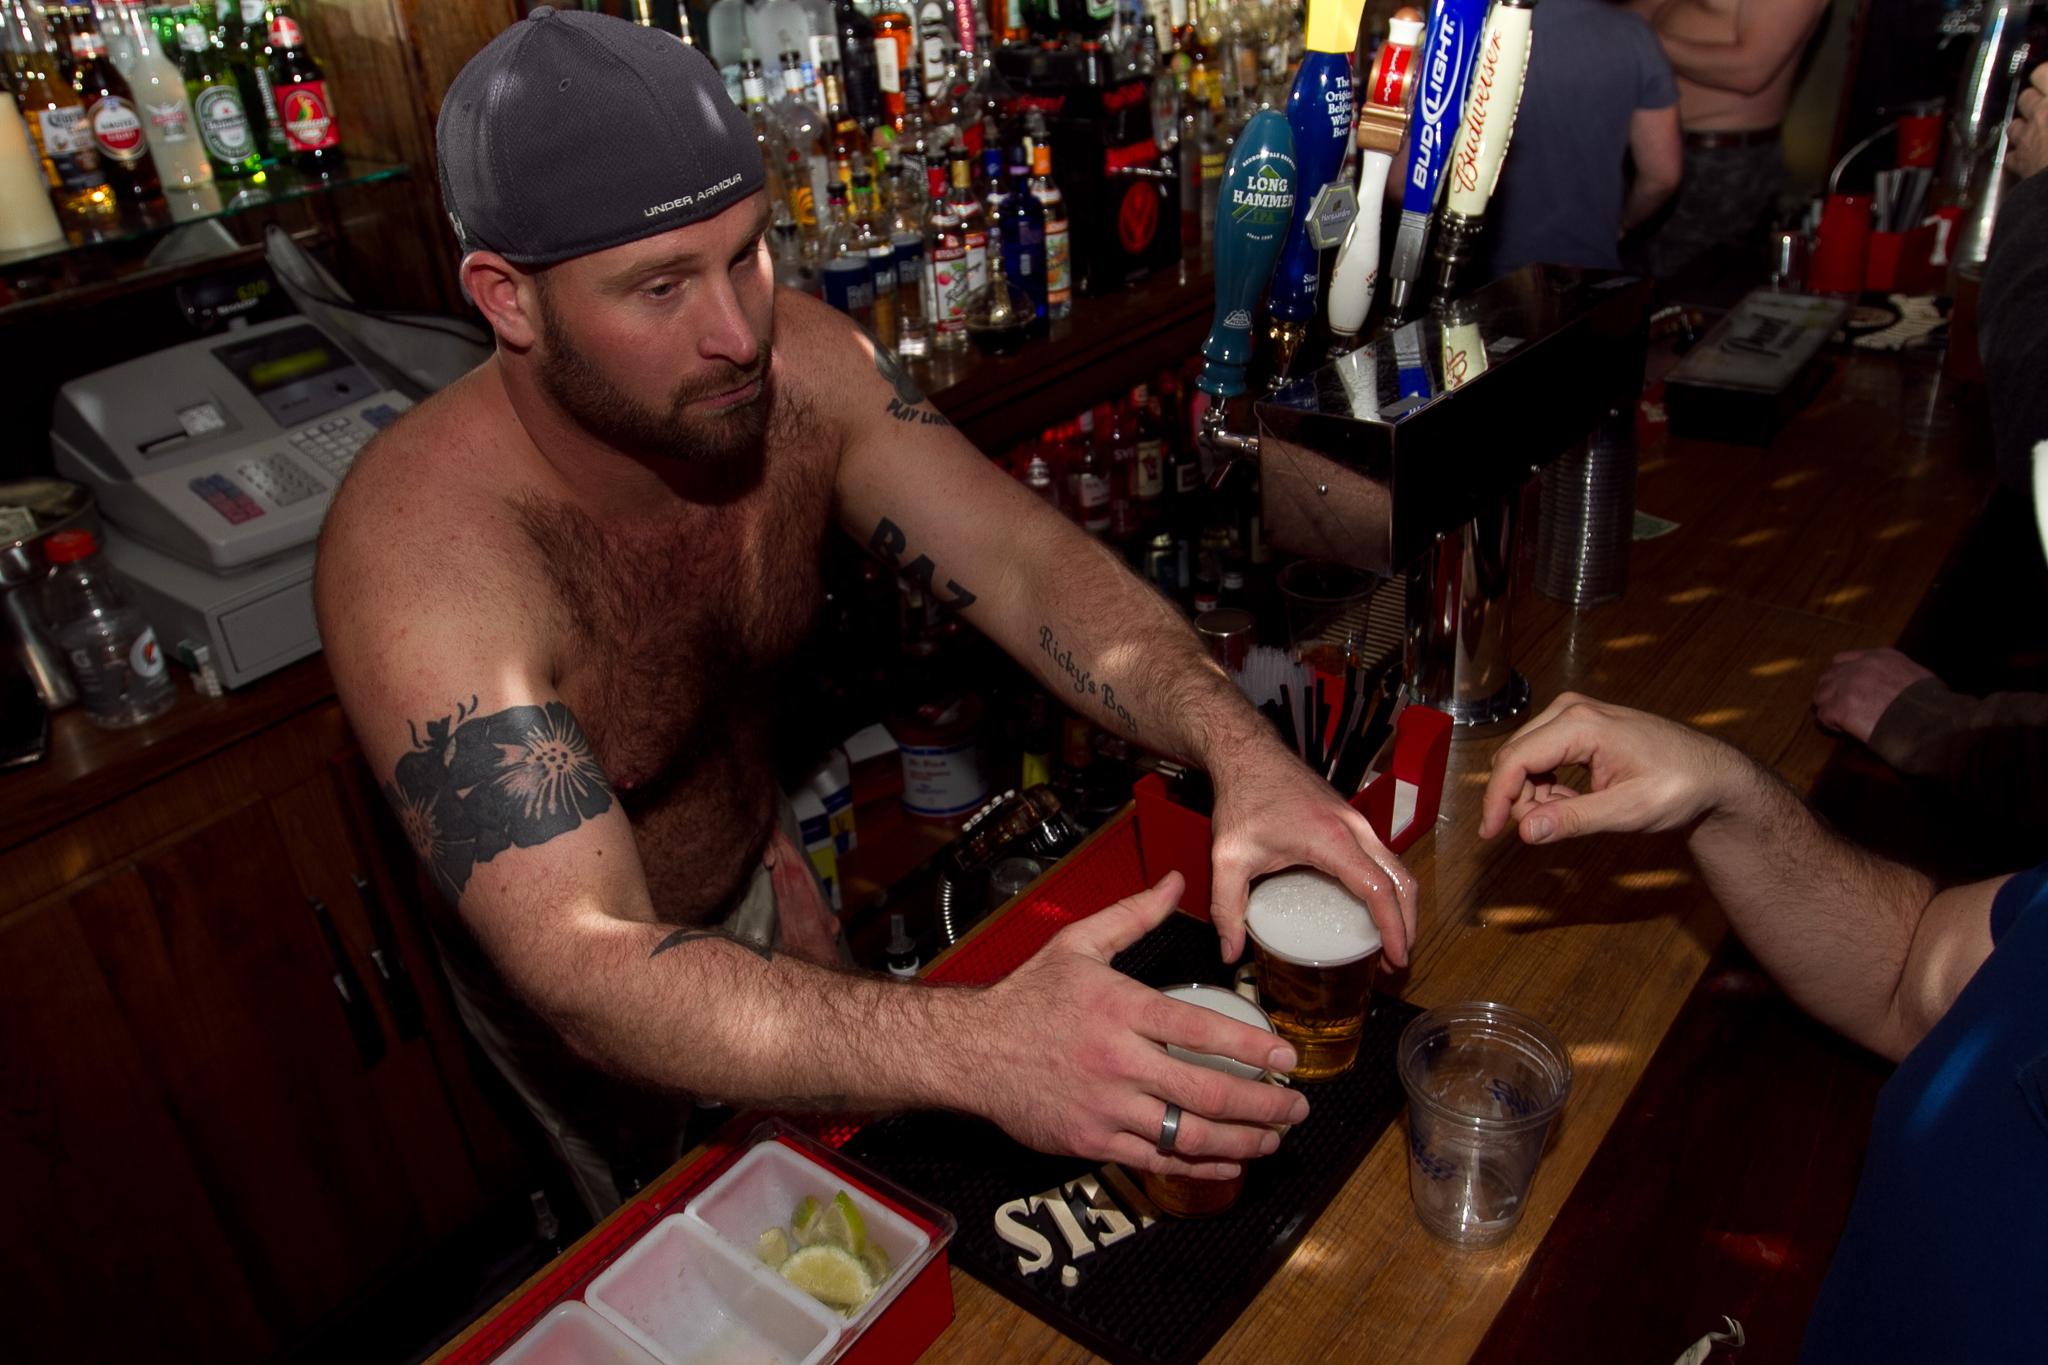 NYC bear bars